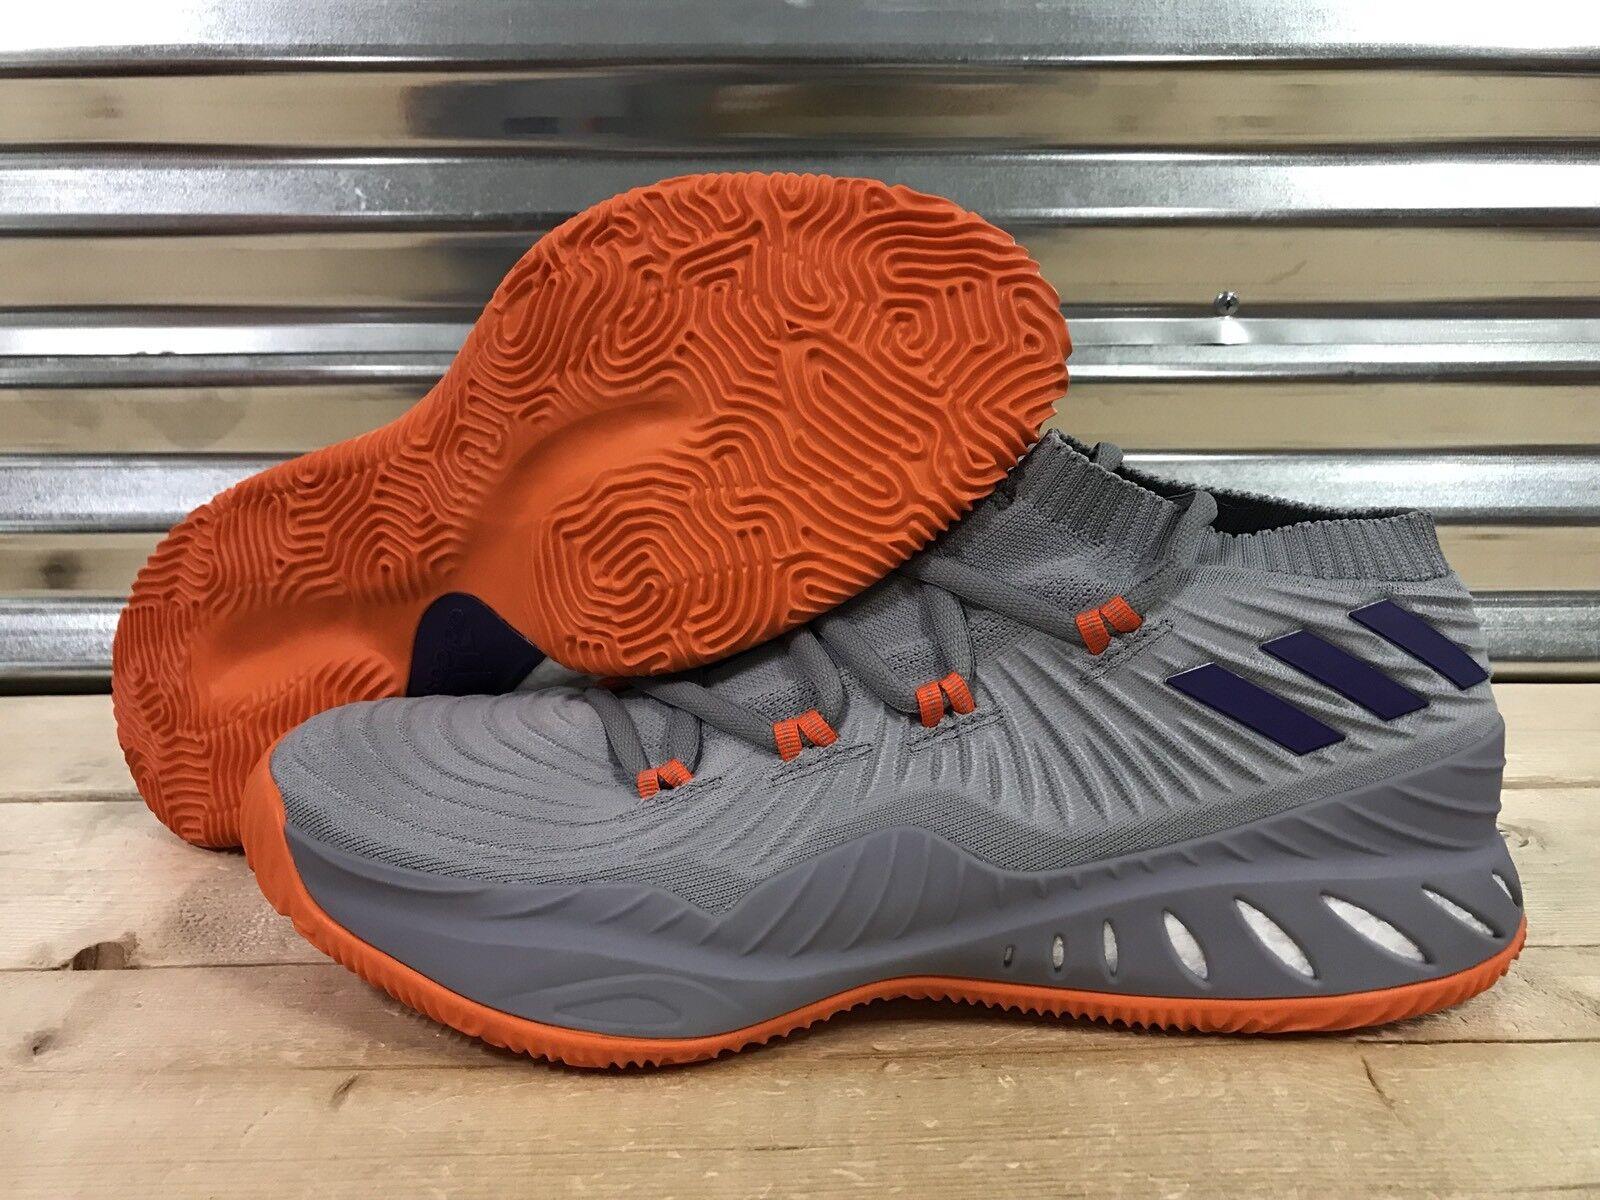 Adidas Crazy Explosive Low 2017 Phoenix Suns PE Dragan Bender grau SZ ( AH2269 )